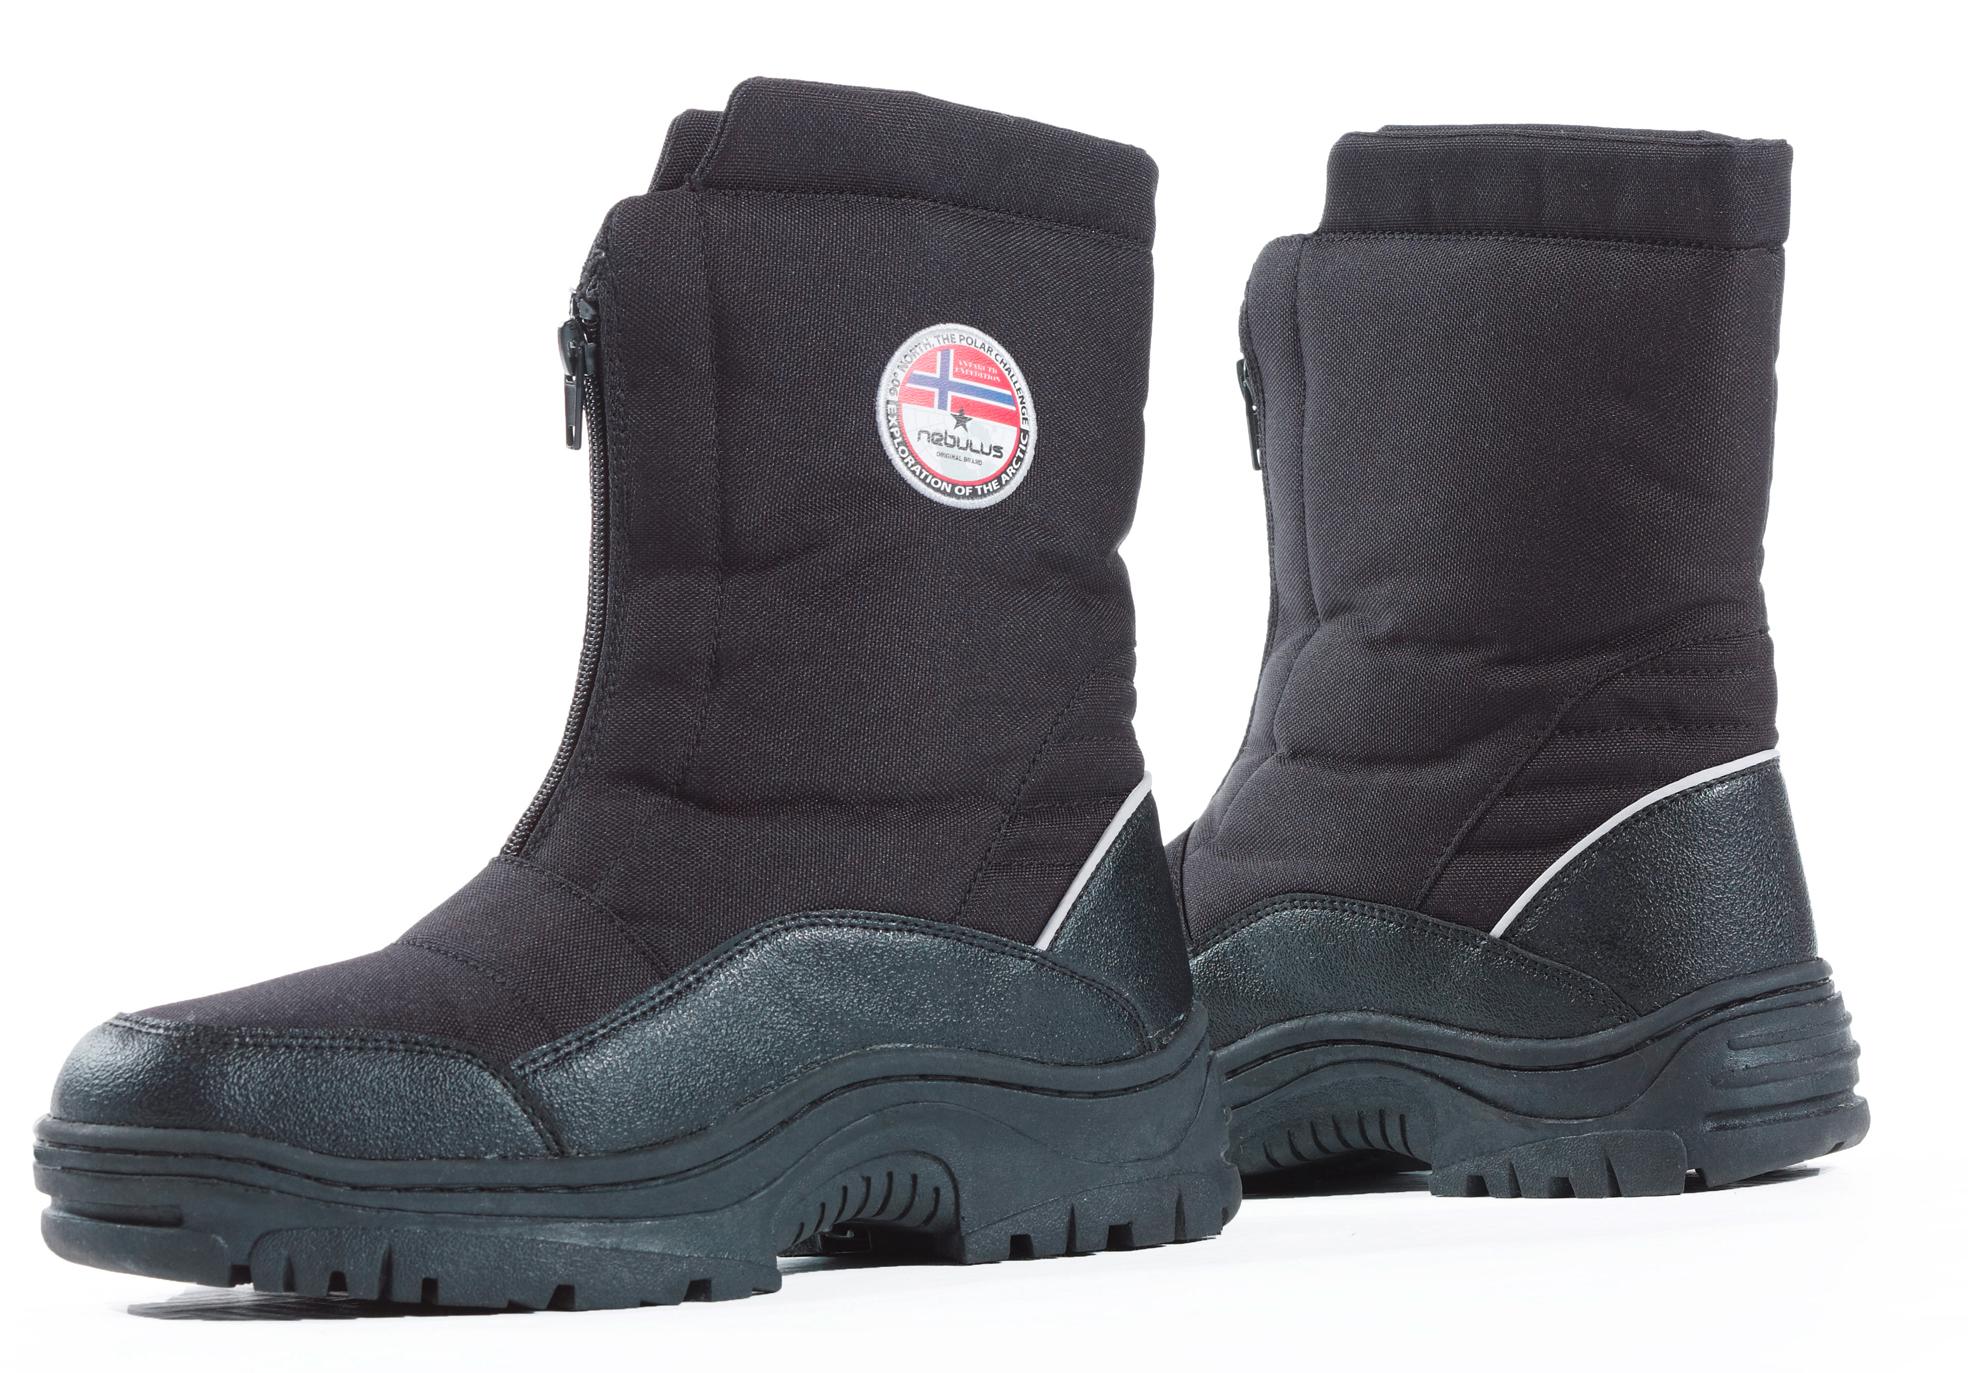 nebulus stiefel herren winterstiefel schwarz 43 schneeschuhe boots. Black Bedroom Furniture Sets. Home Design Ideas